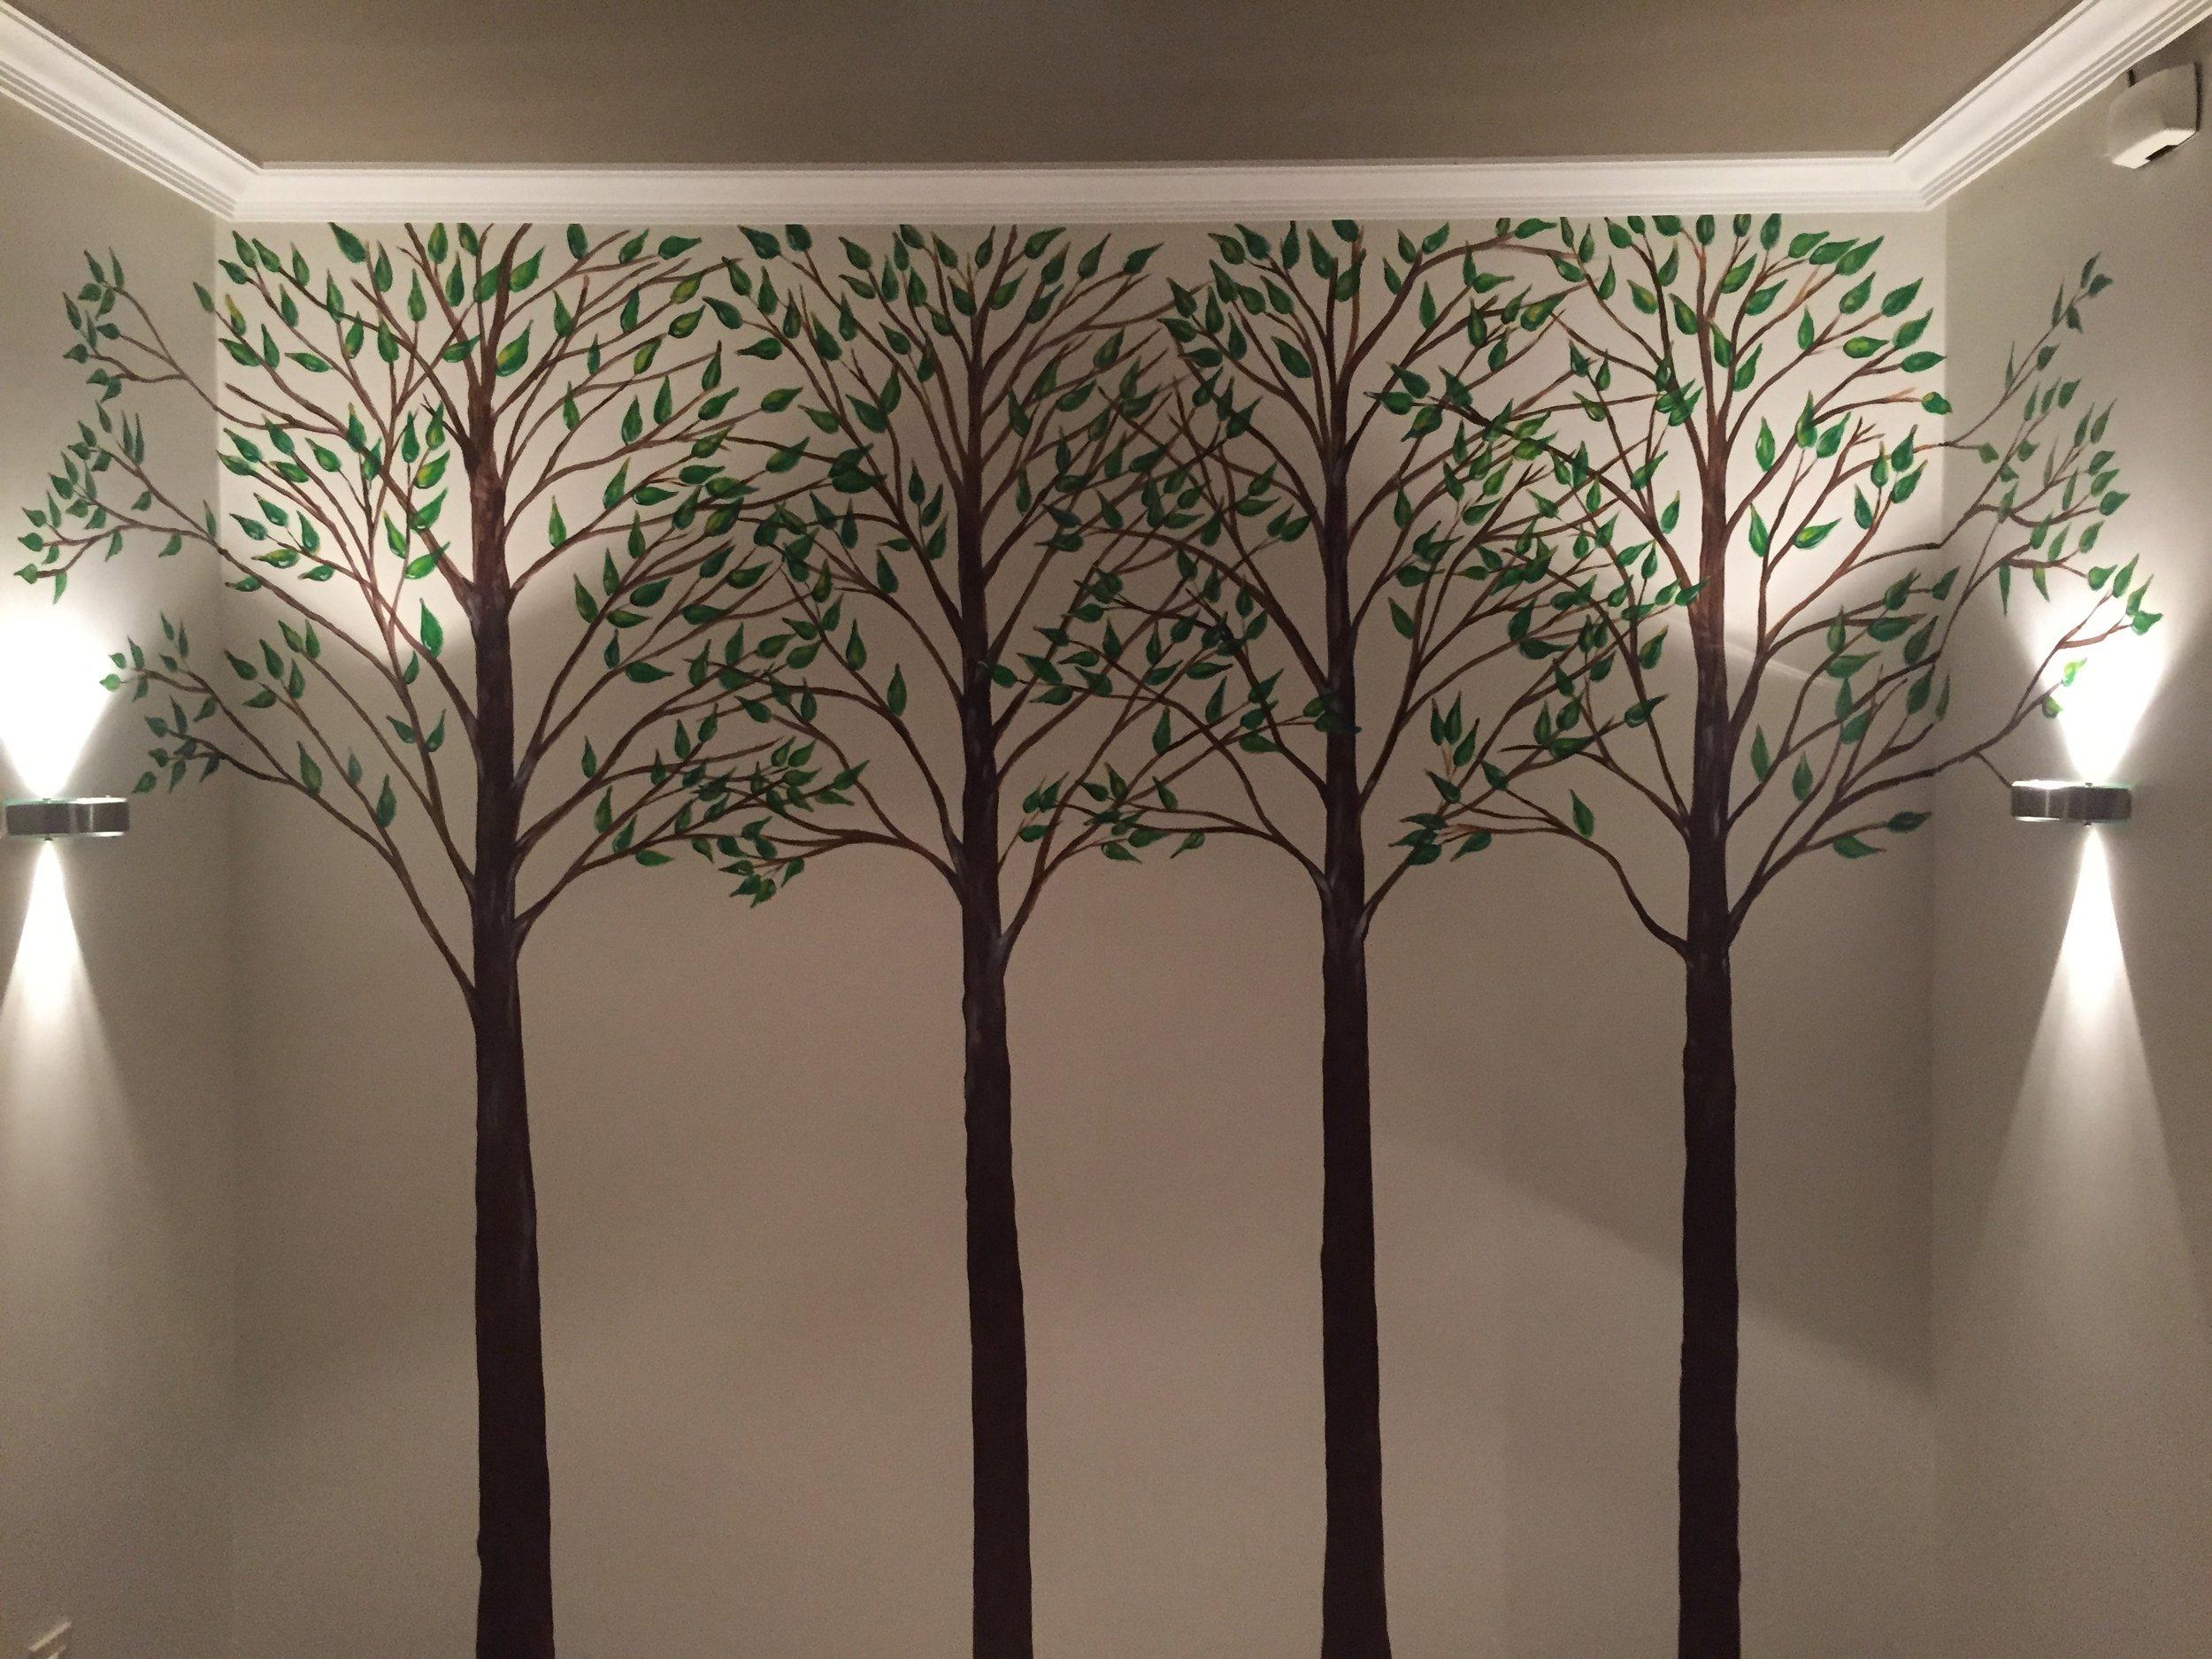 Pared con cuatro árboles - Ourense